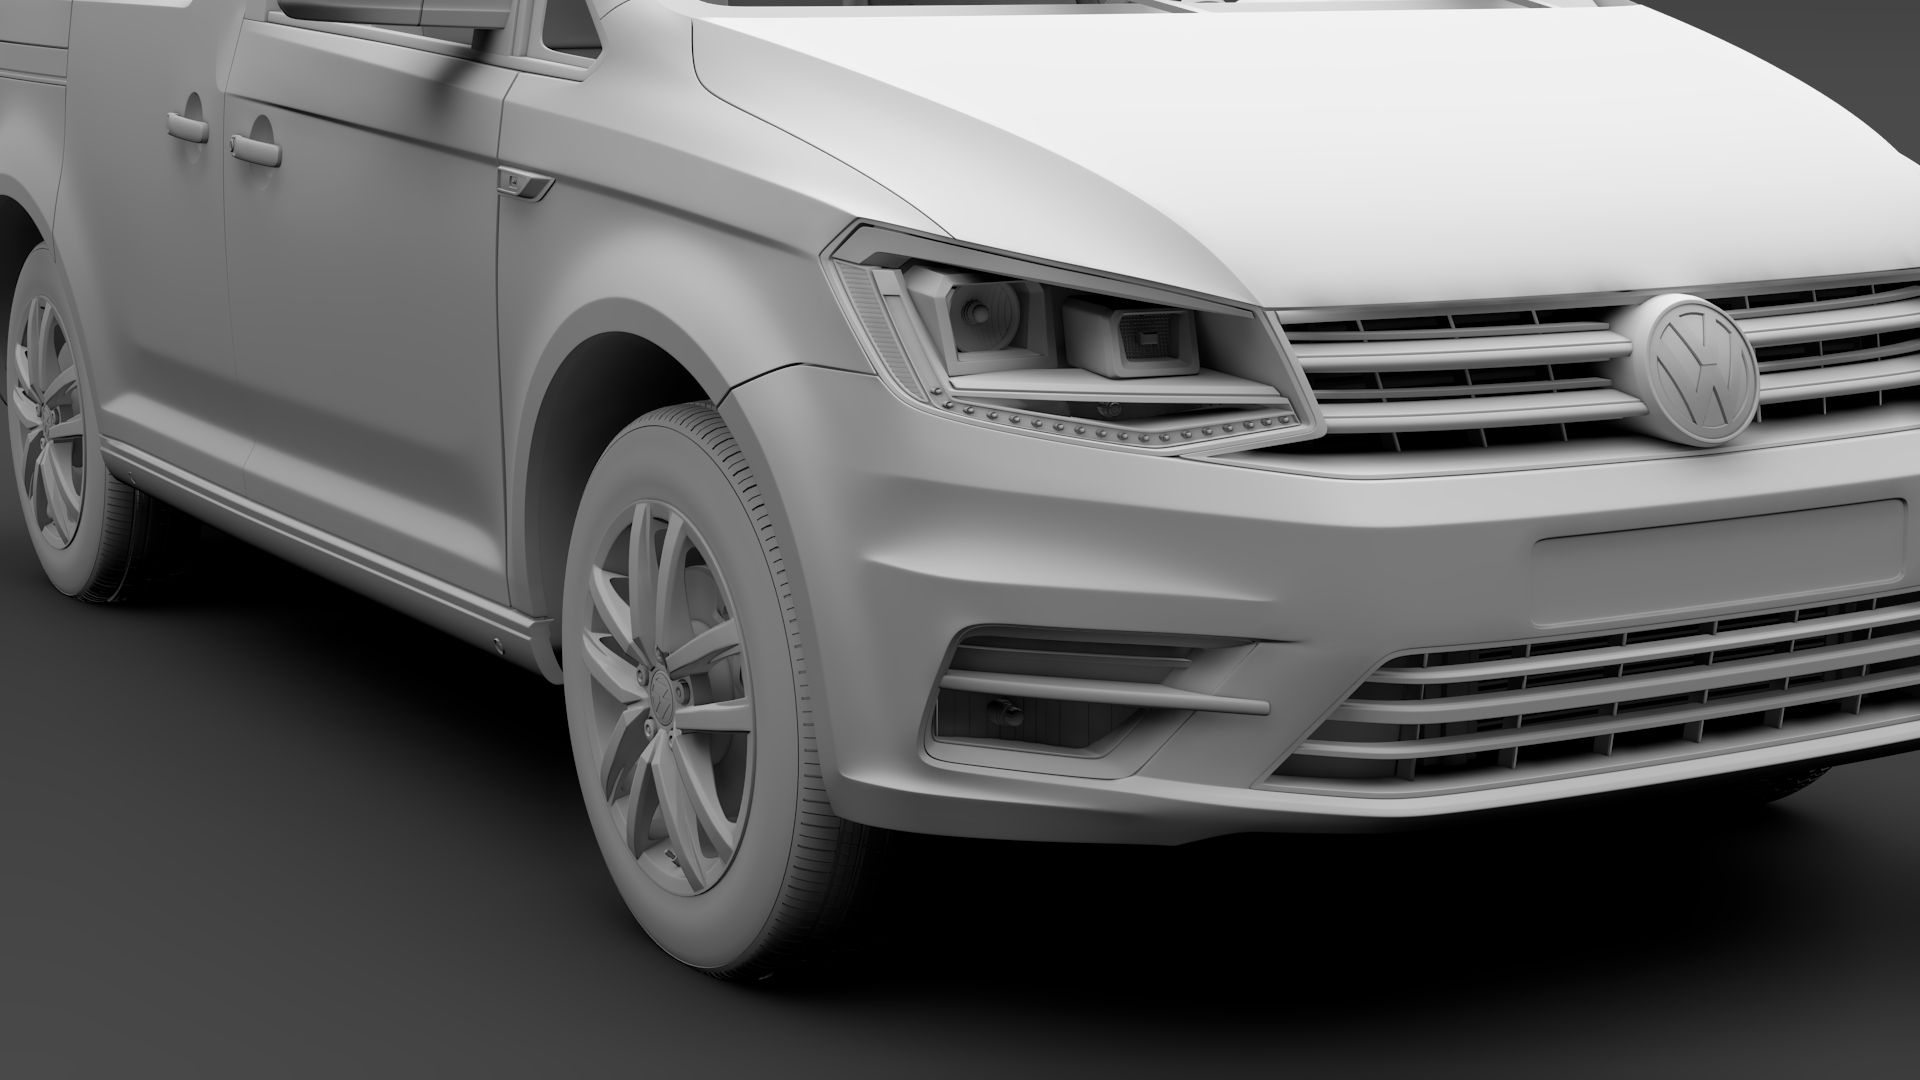 volkswagen caddy 2018 3d model max fbx c4d lwo ma mb hrc xsi obj 283808